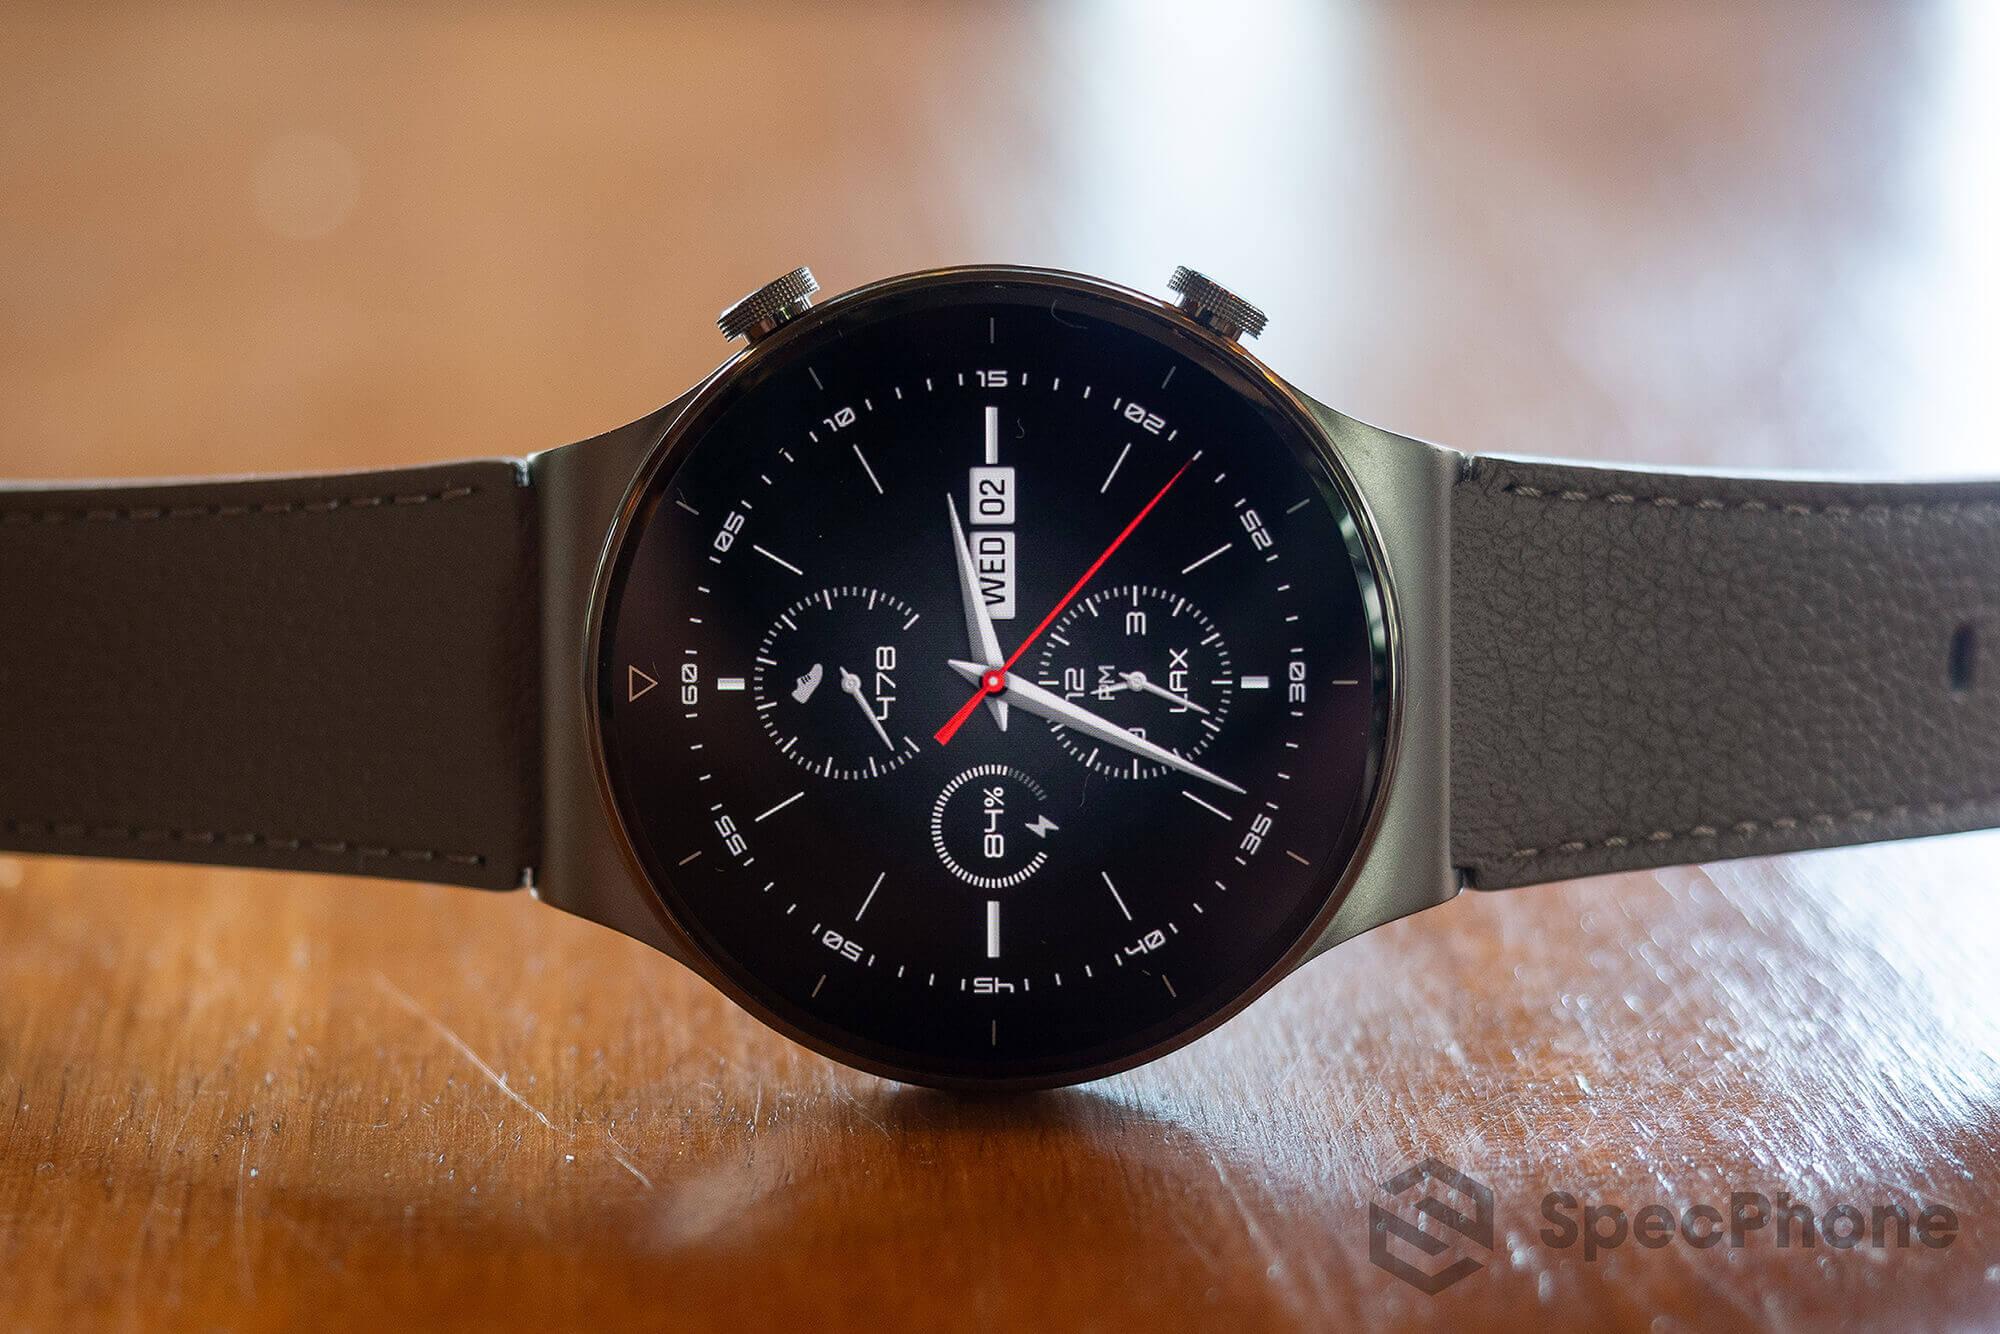 Review Huawei Watch GT 2 Pro SpecPhone 13